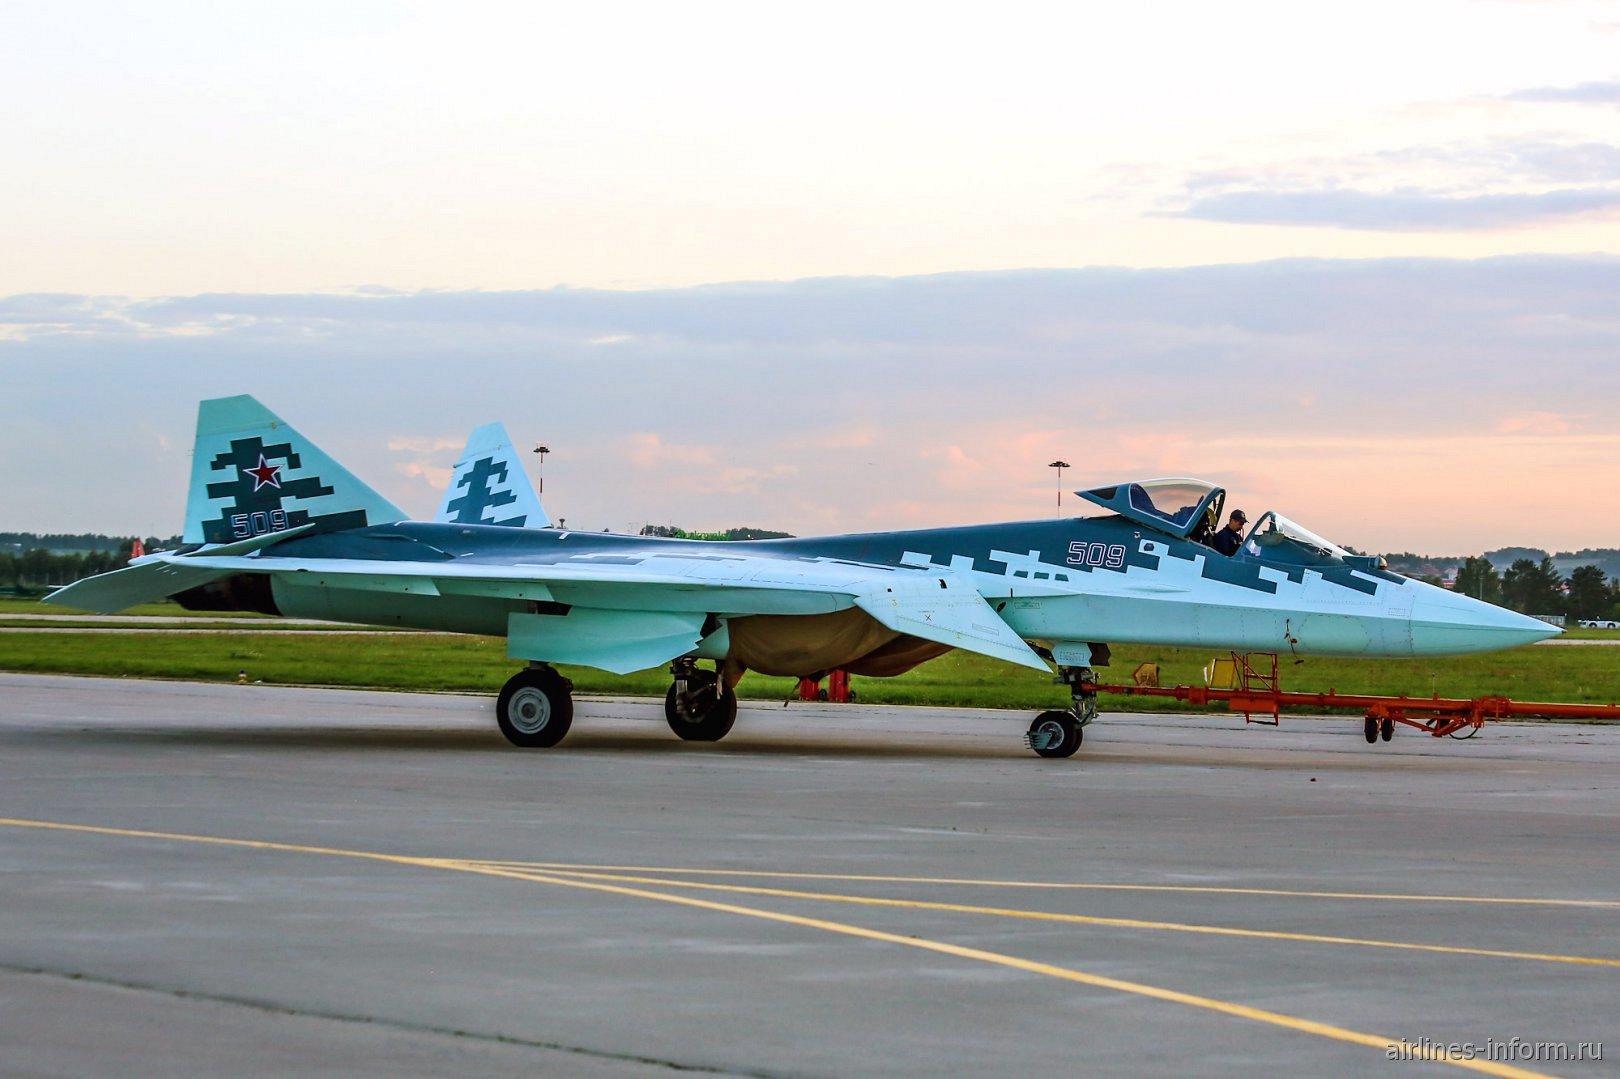 Фото истребителя Су-57 (Т-50)